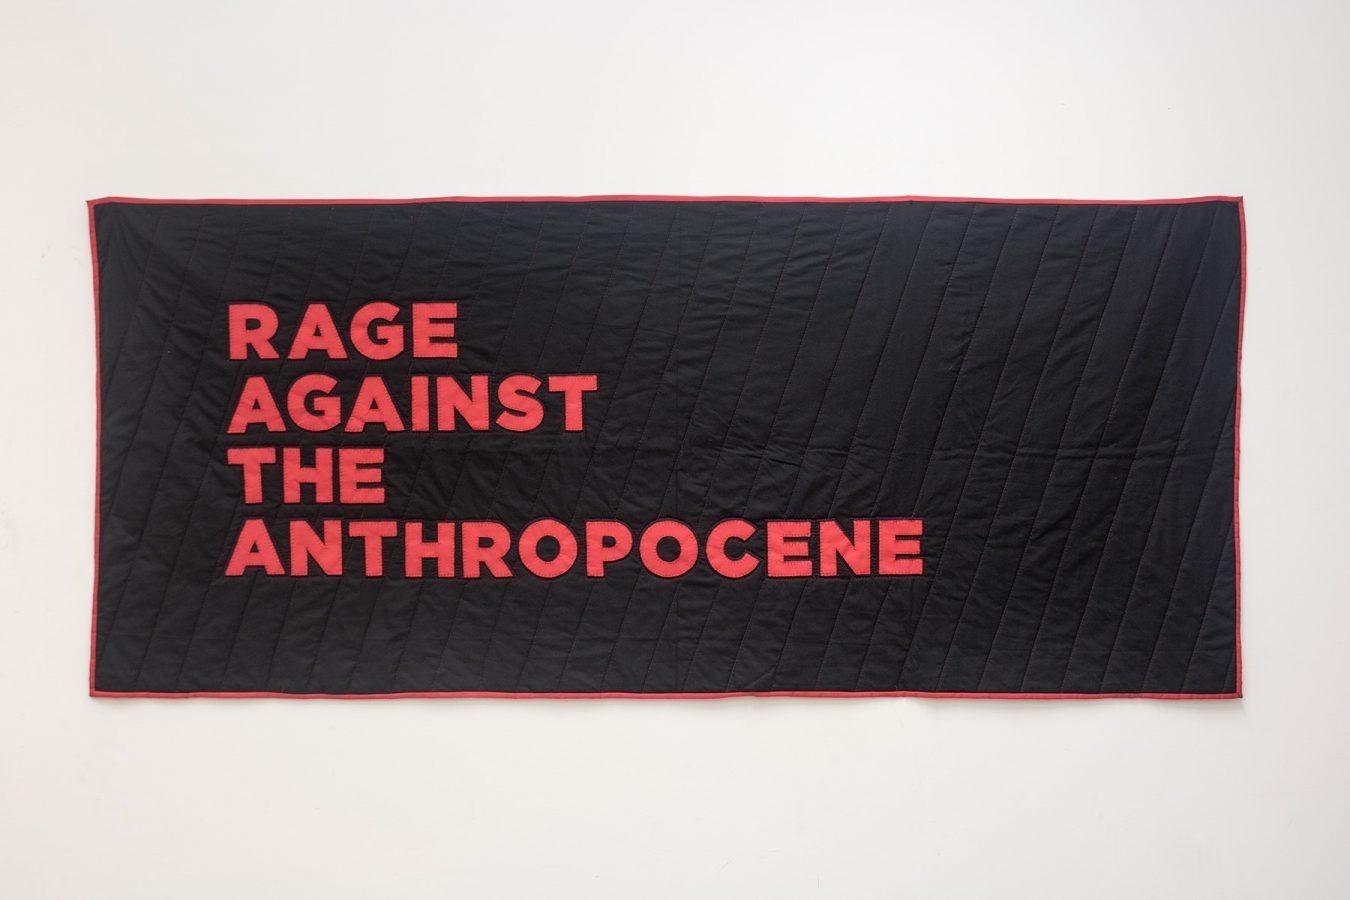 Rage Against the Anthropocene